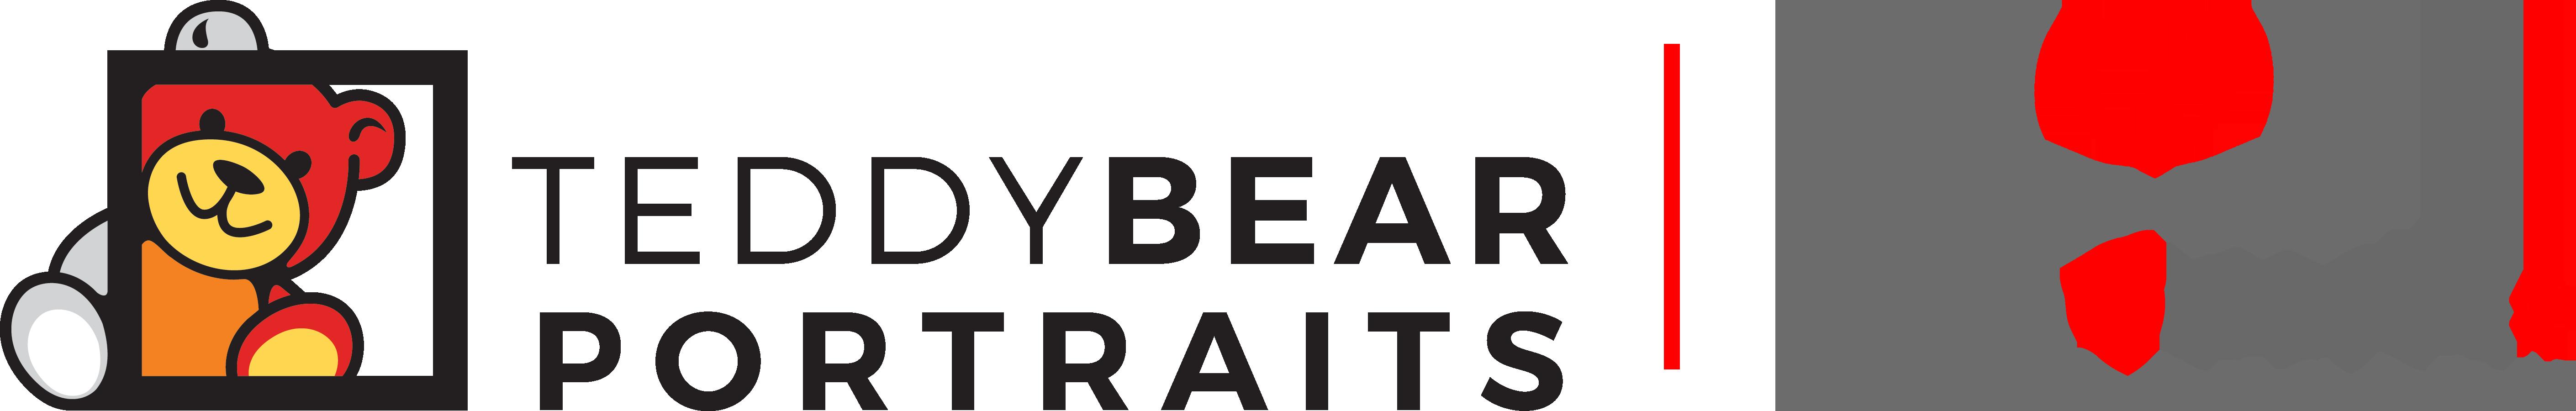 Teddybear Portraits